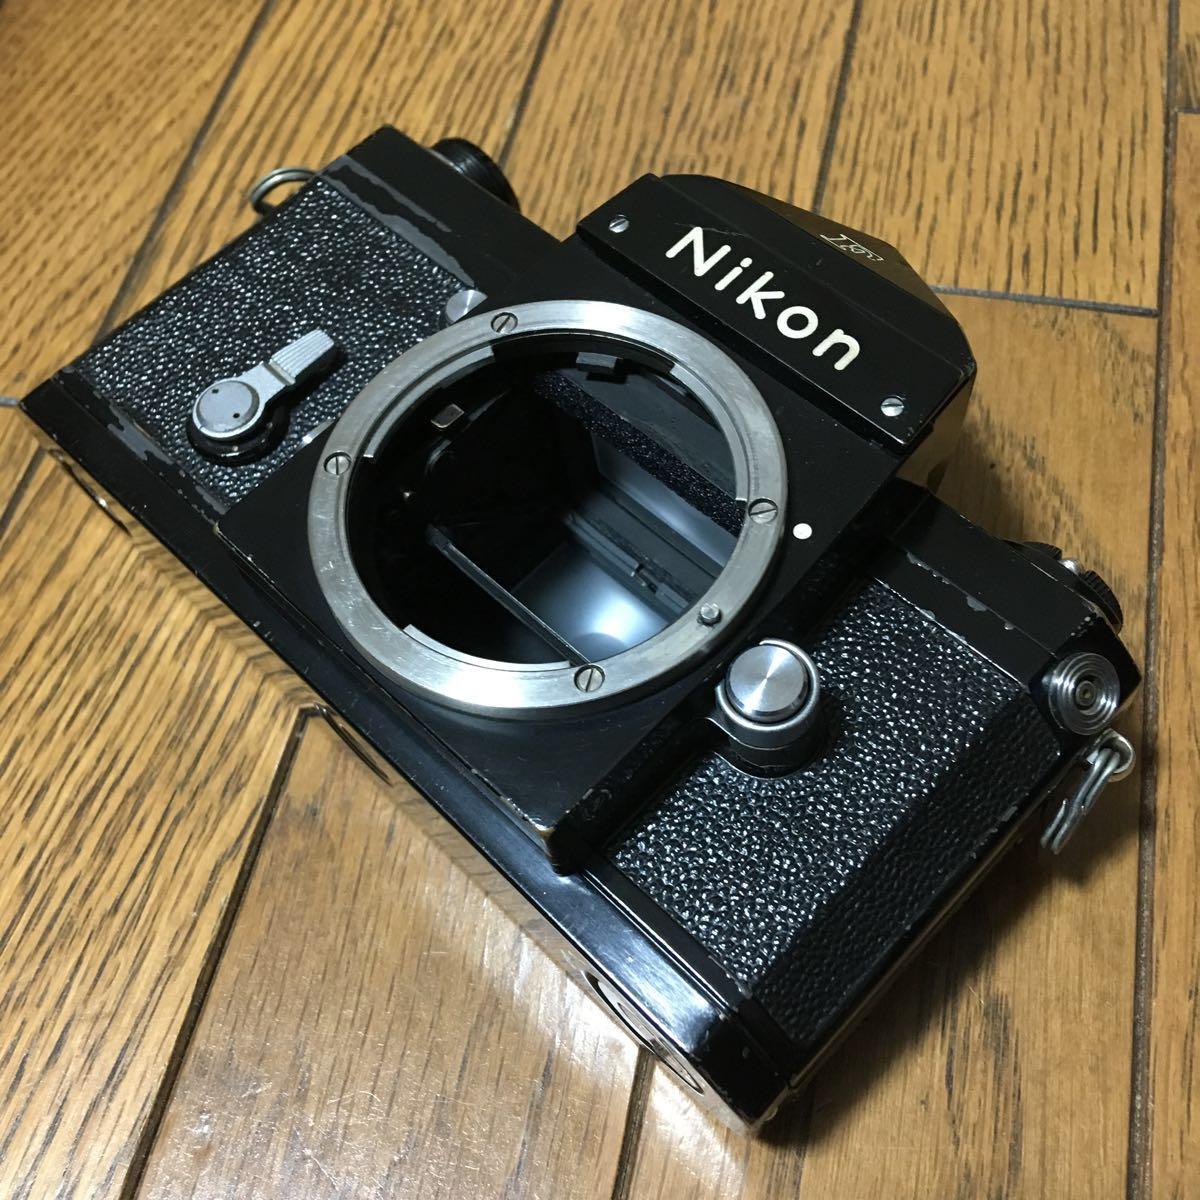 Nikon F アイレベル ブラック ボディ 646万台 前期型 動作確認済みです。_画像9